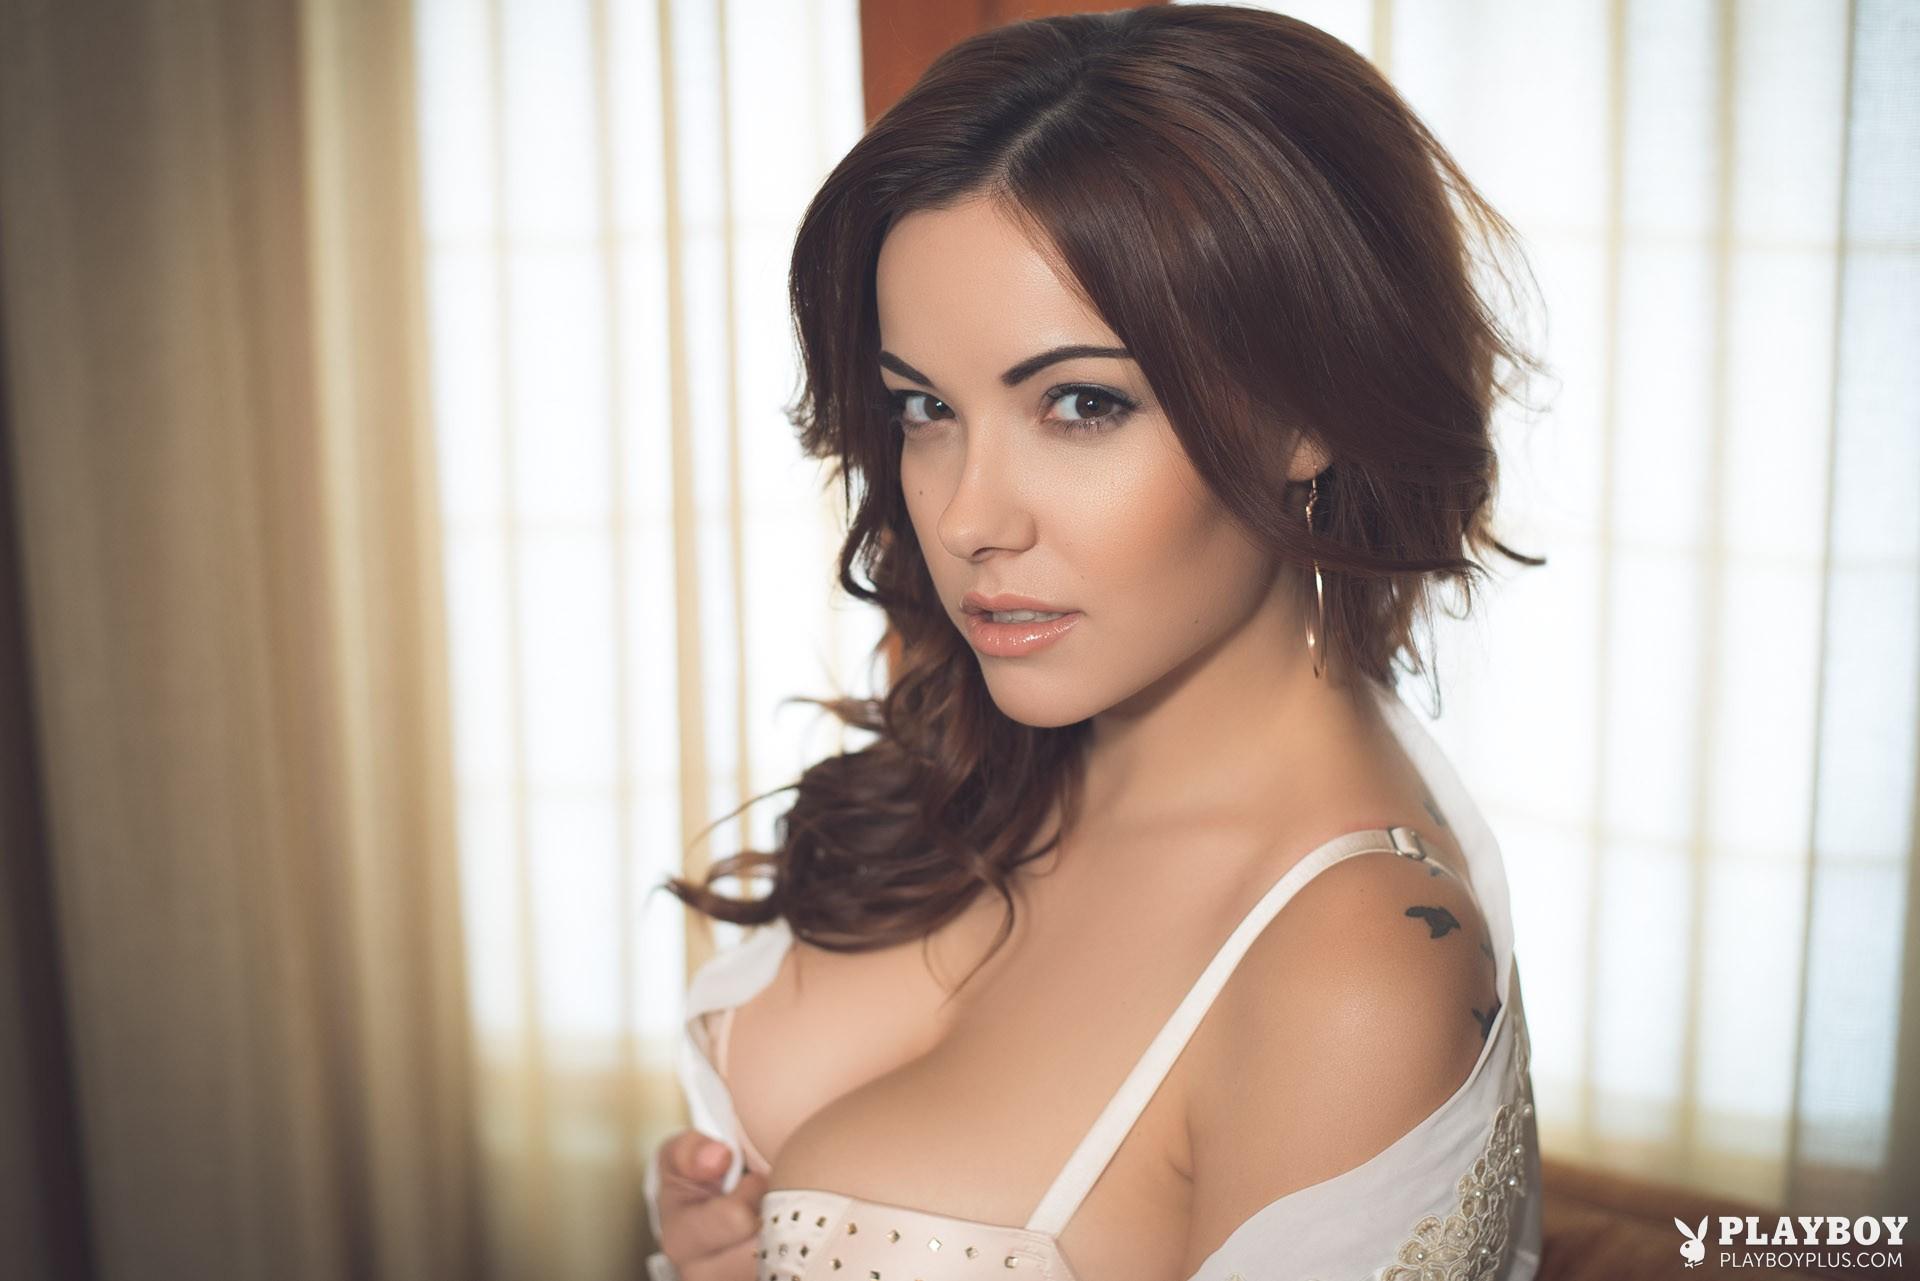 Hot solo babe Elizabeth Marxs posing for Playboy centerfold shoot outdoors № 83907 загрузить